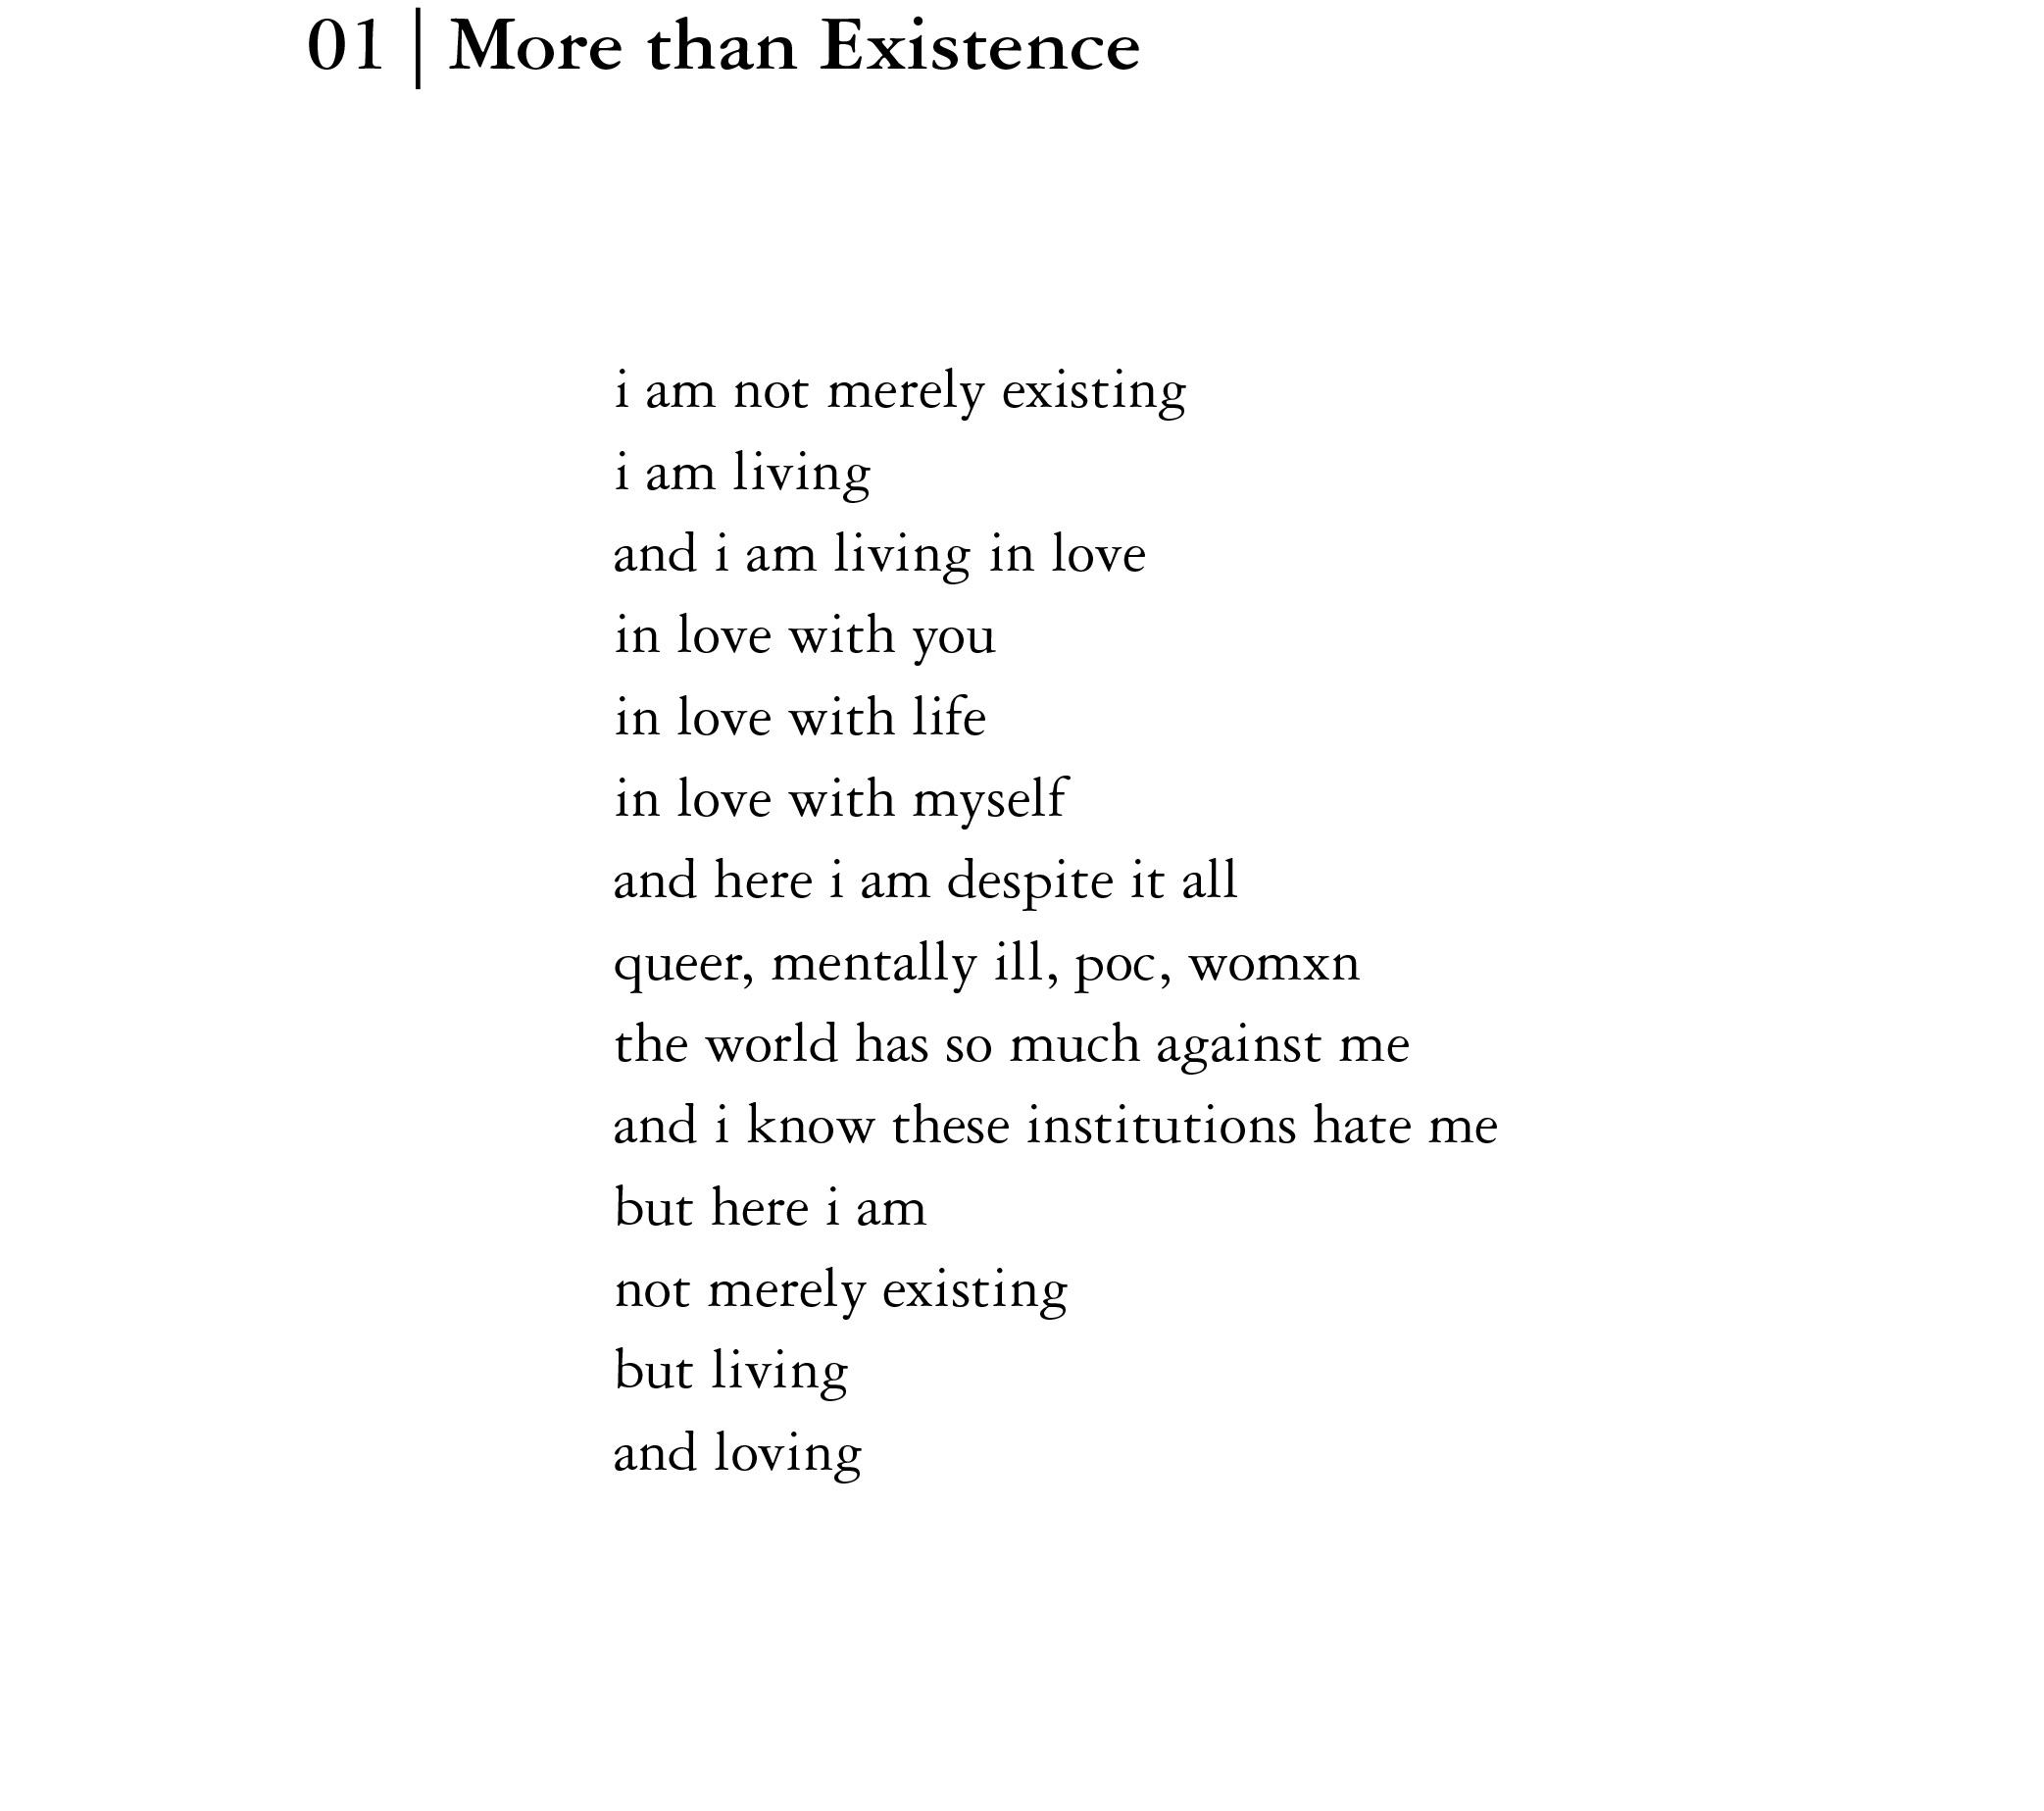 tong oi poems-01.jpg